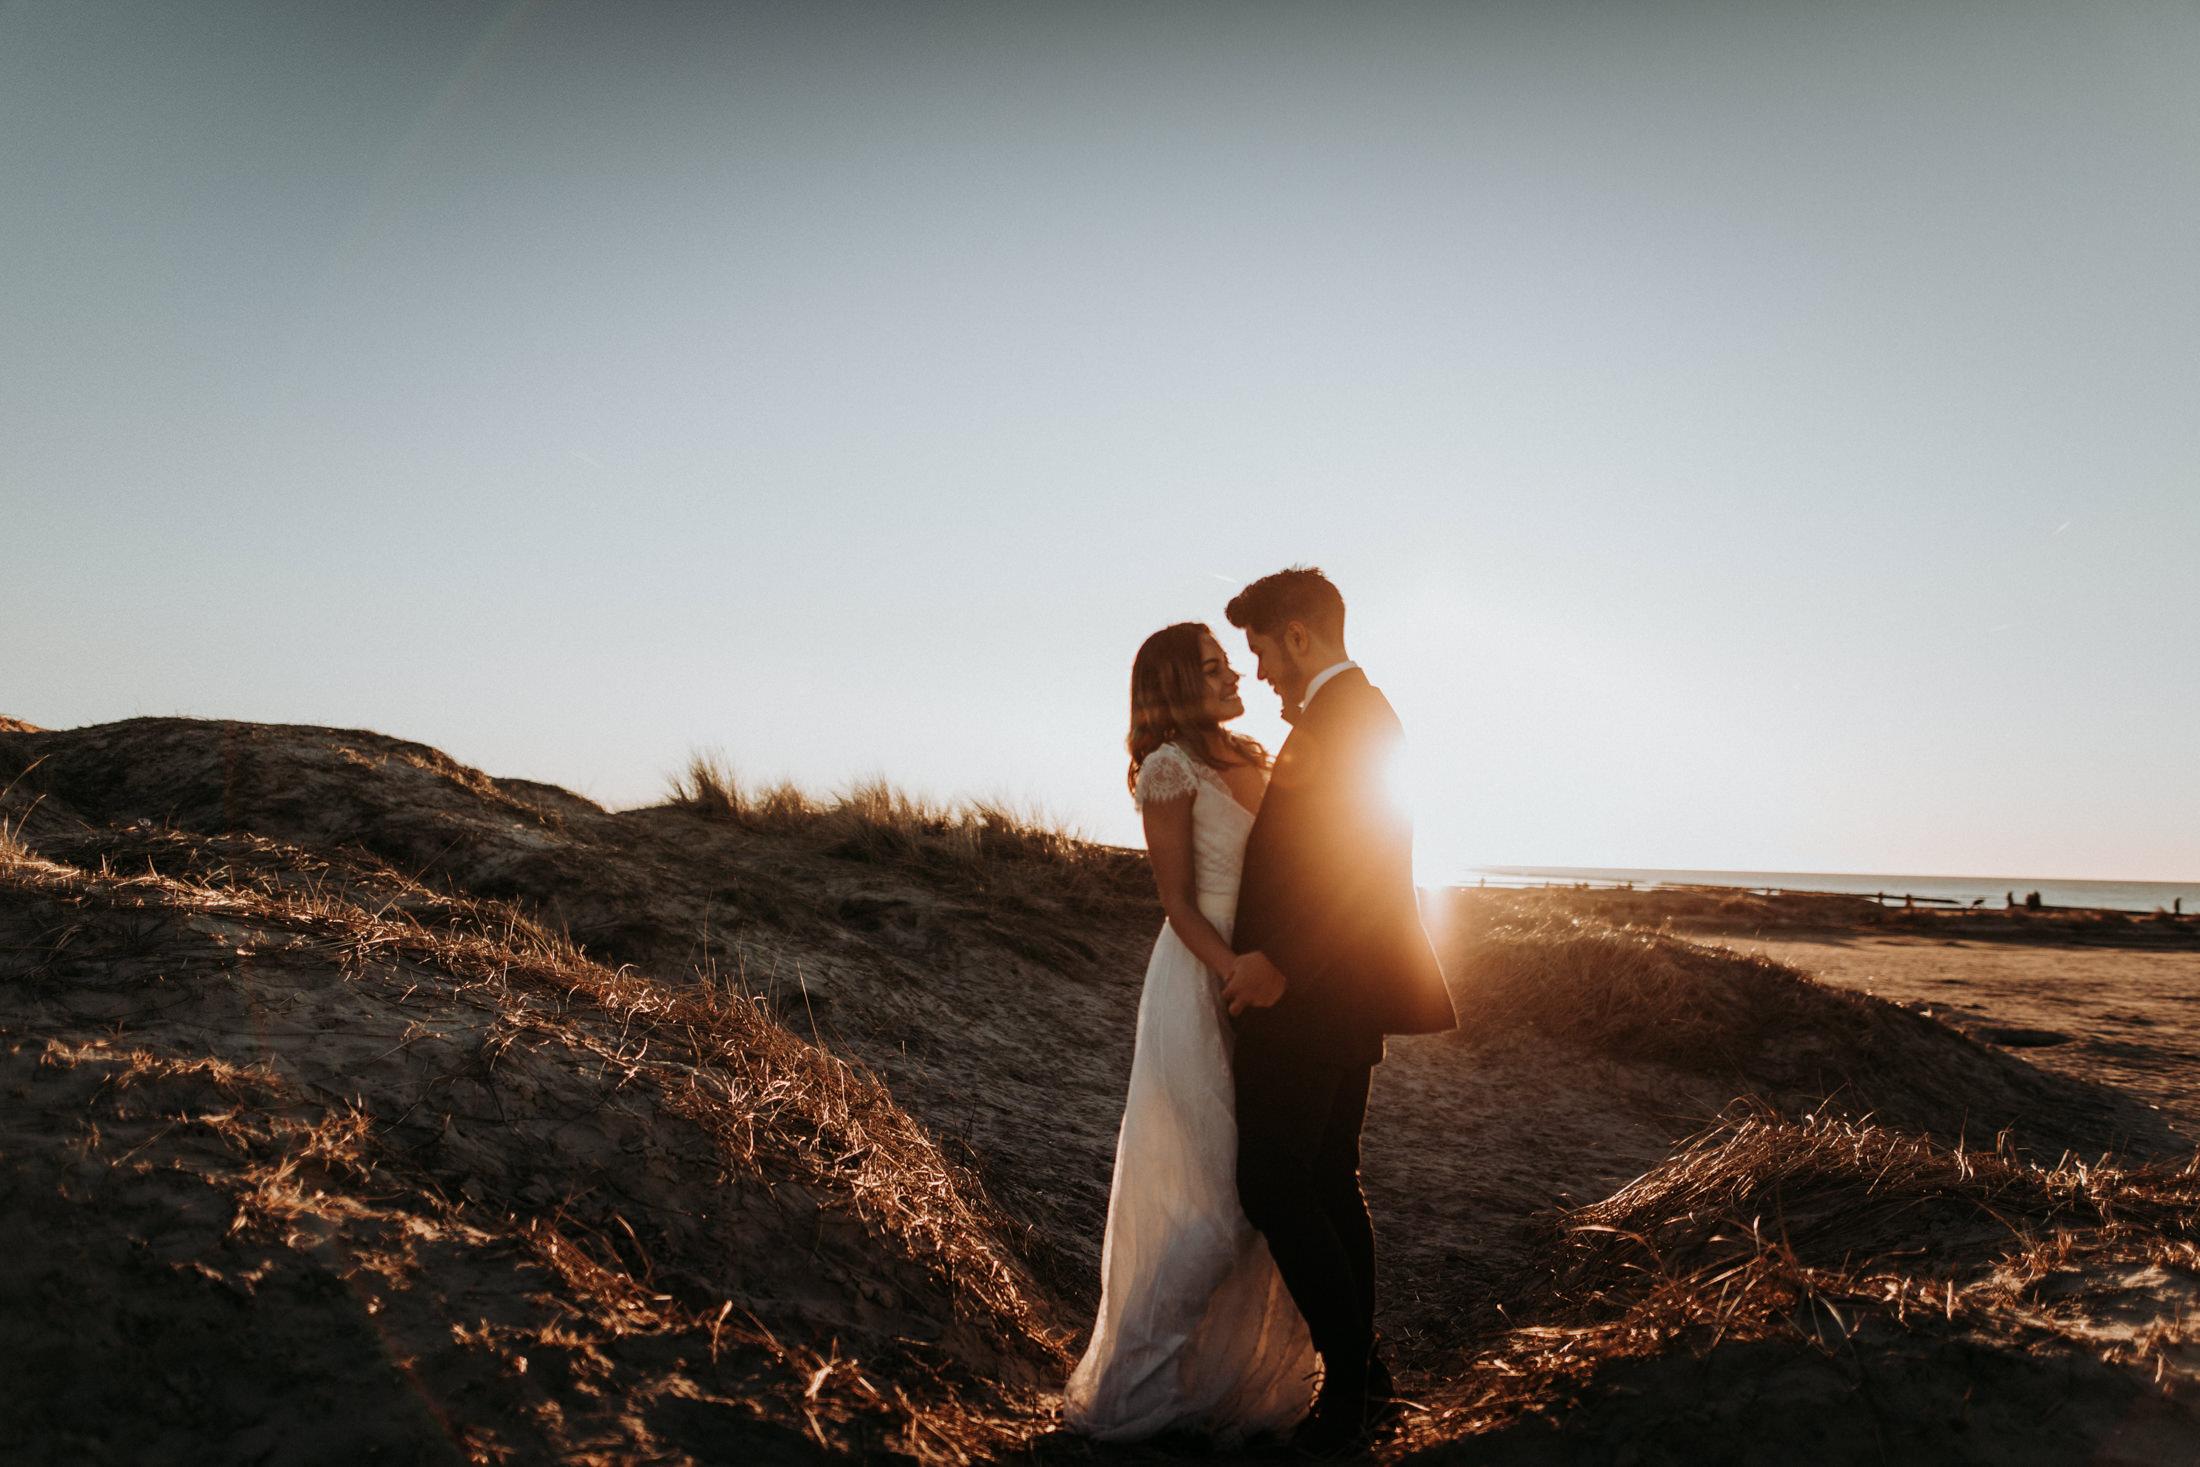 Wedding_Photographer_Mallorca_Daniela-Marquardt_Photography_CanaryIslands_Lanzarote_Iceland_Tuskany_Santorini_Portugal_Schweiz_Austria_Bayern_Elopement_Hochzeitsfotograf_Norddeichich_31